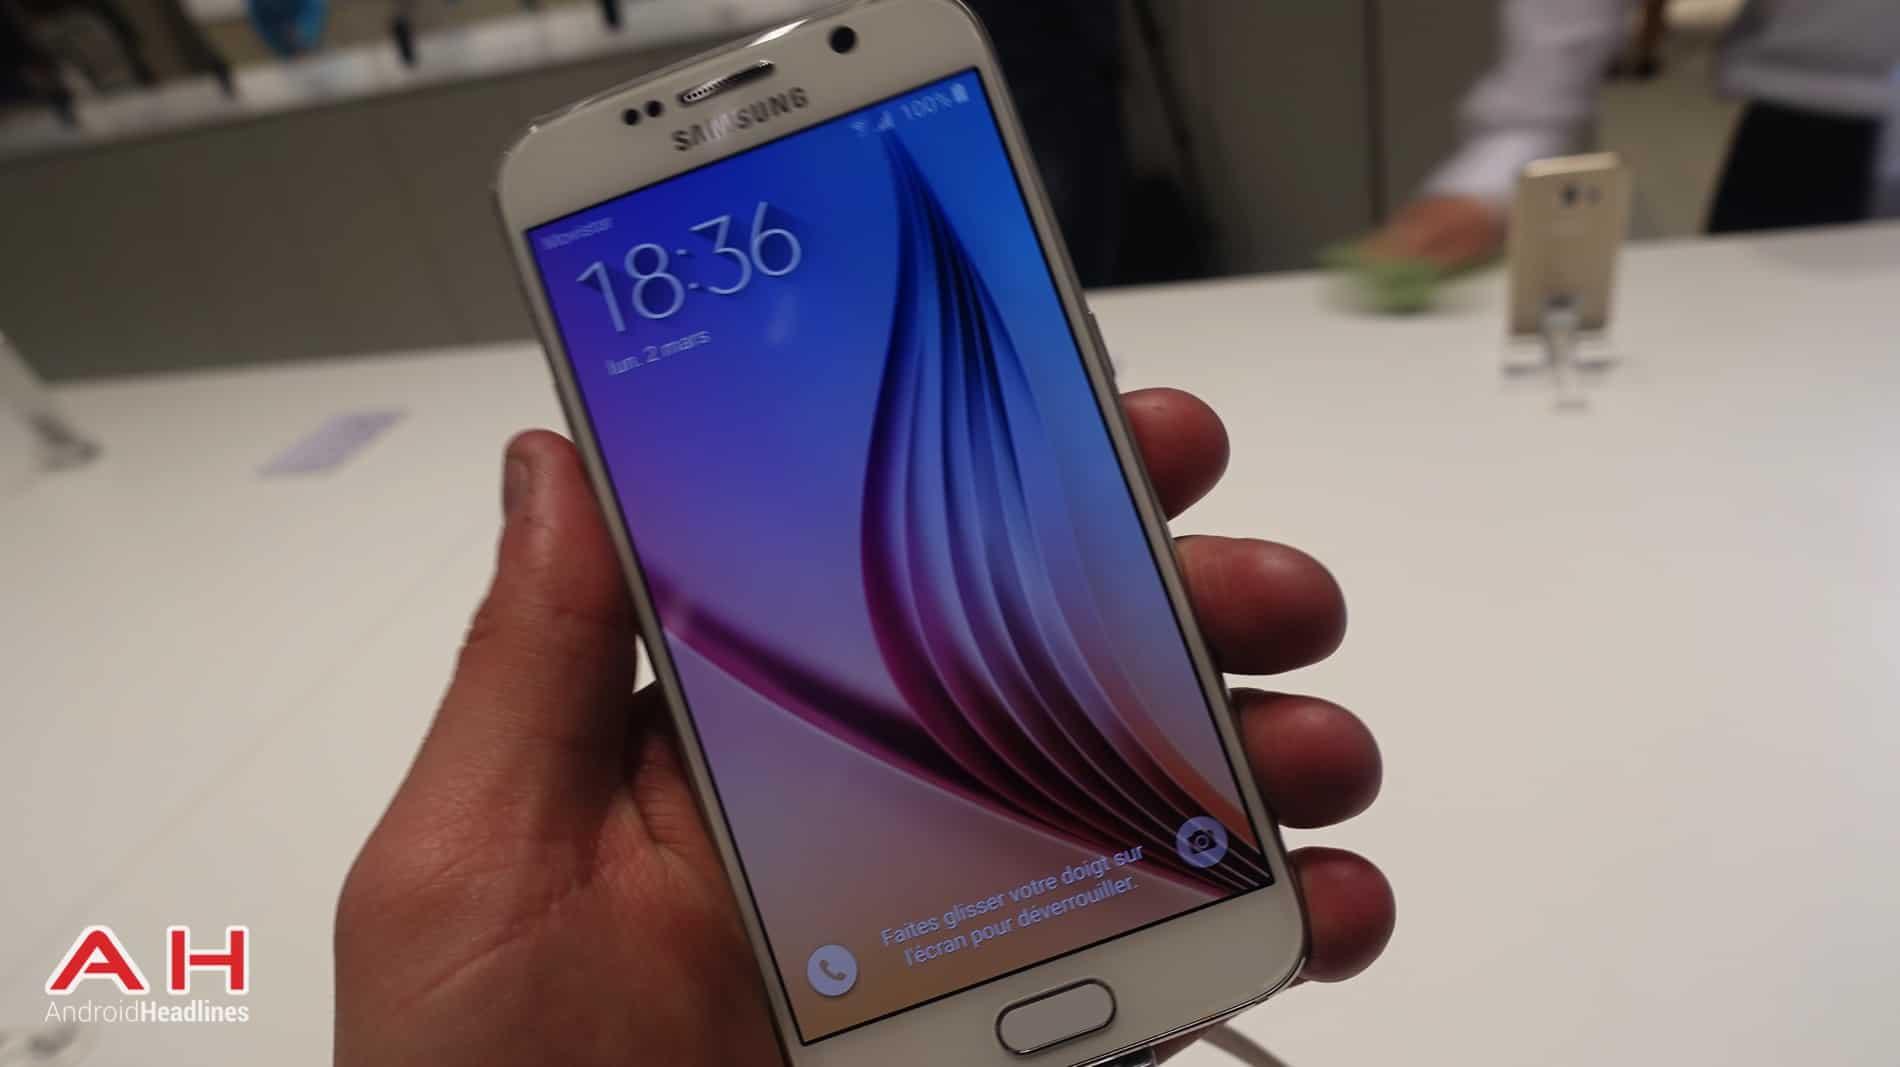 Galaxy S6 and Galaxy S6 Edge MWC AH 04